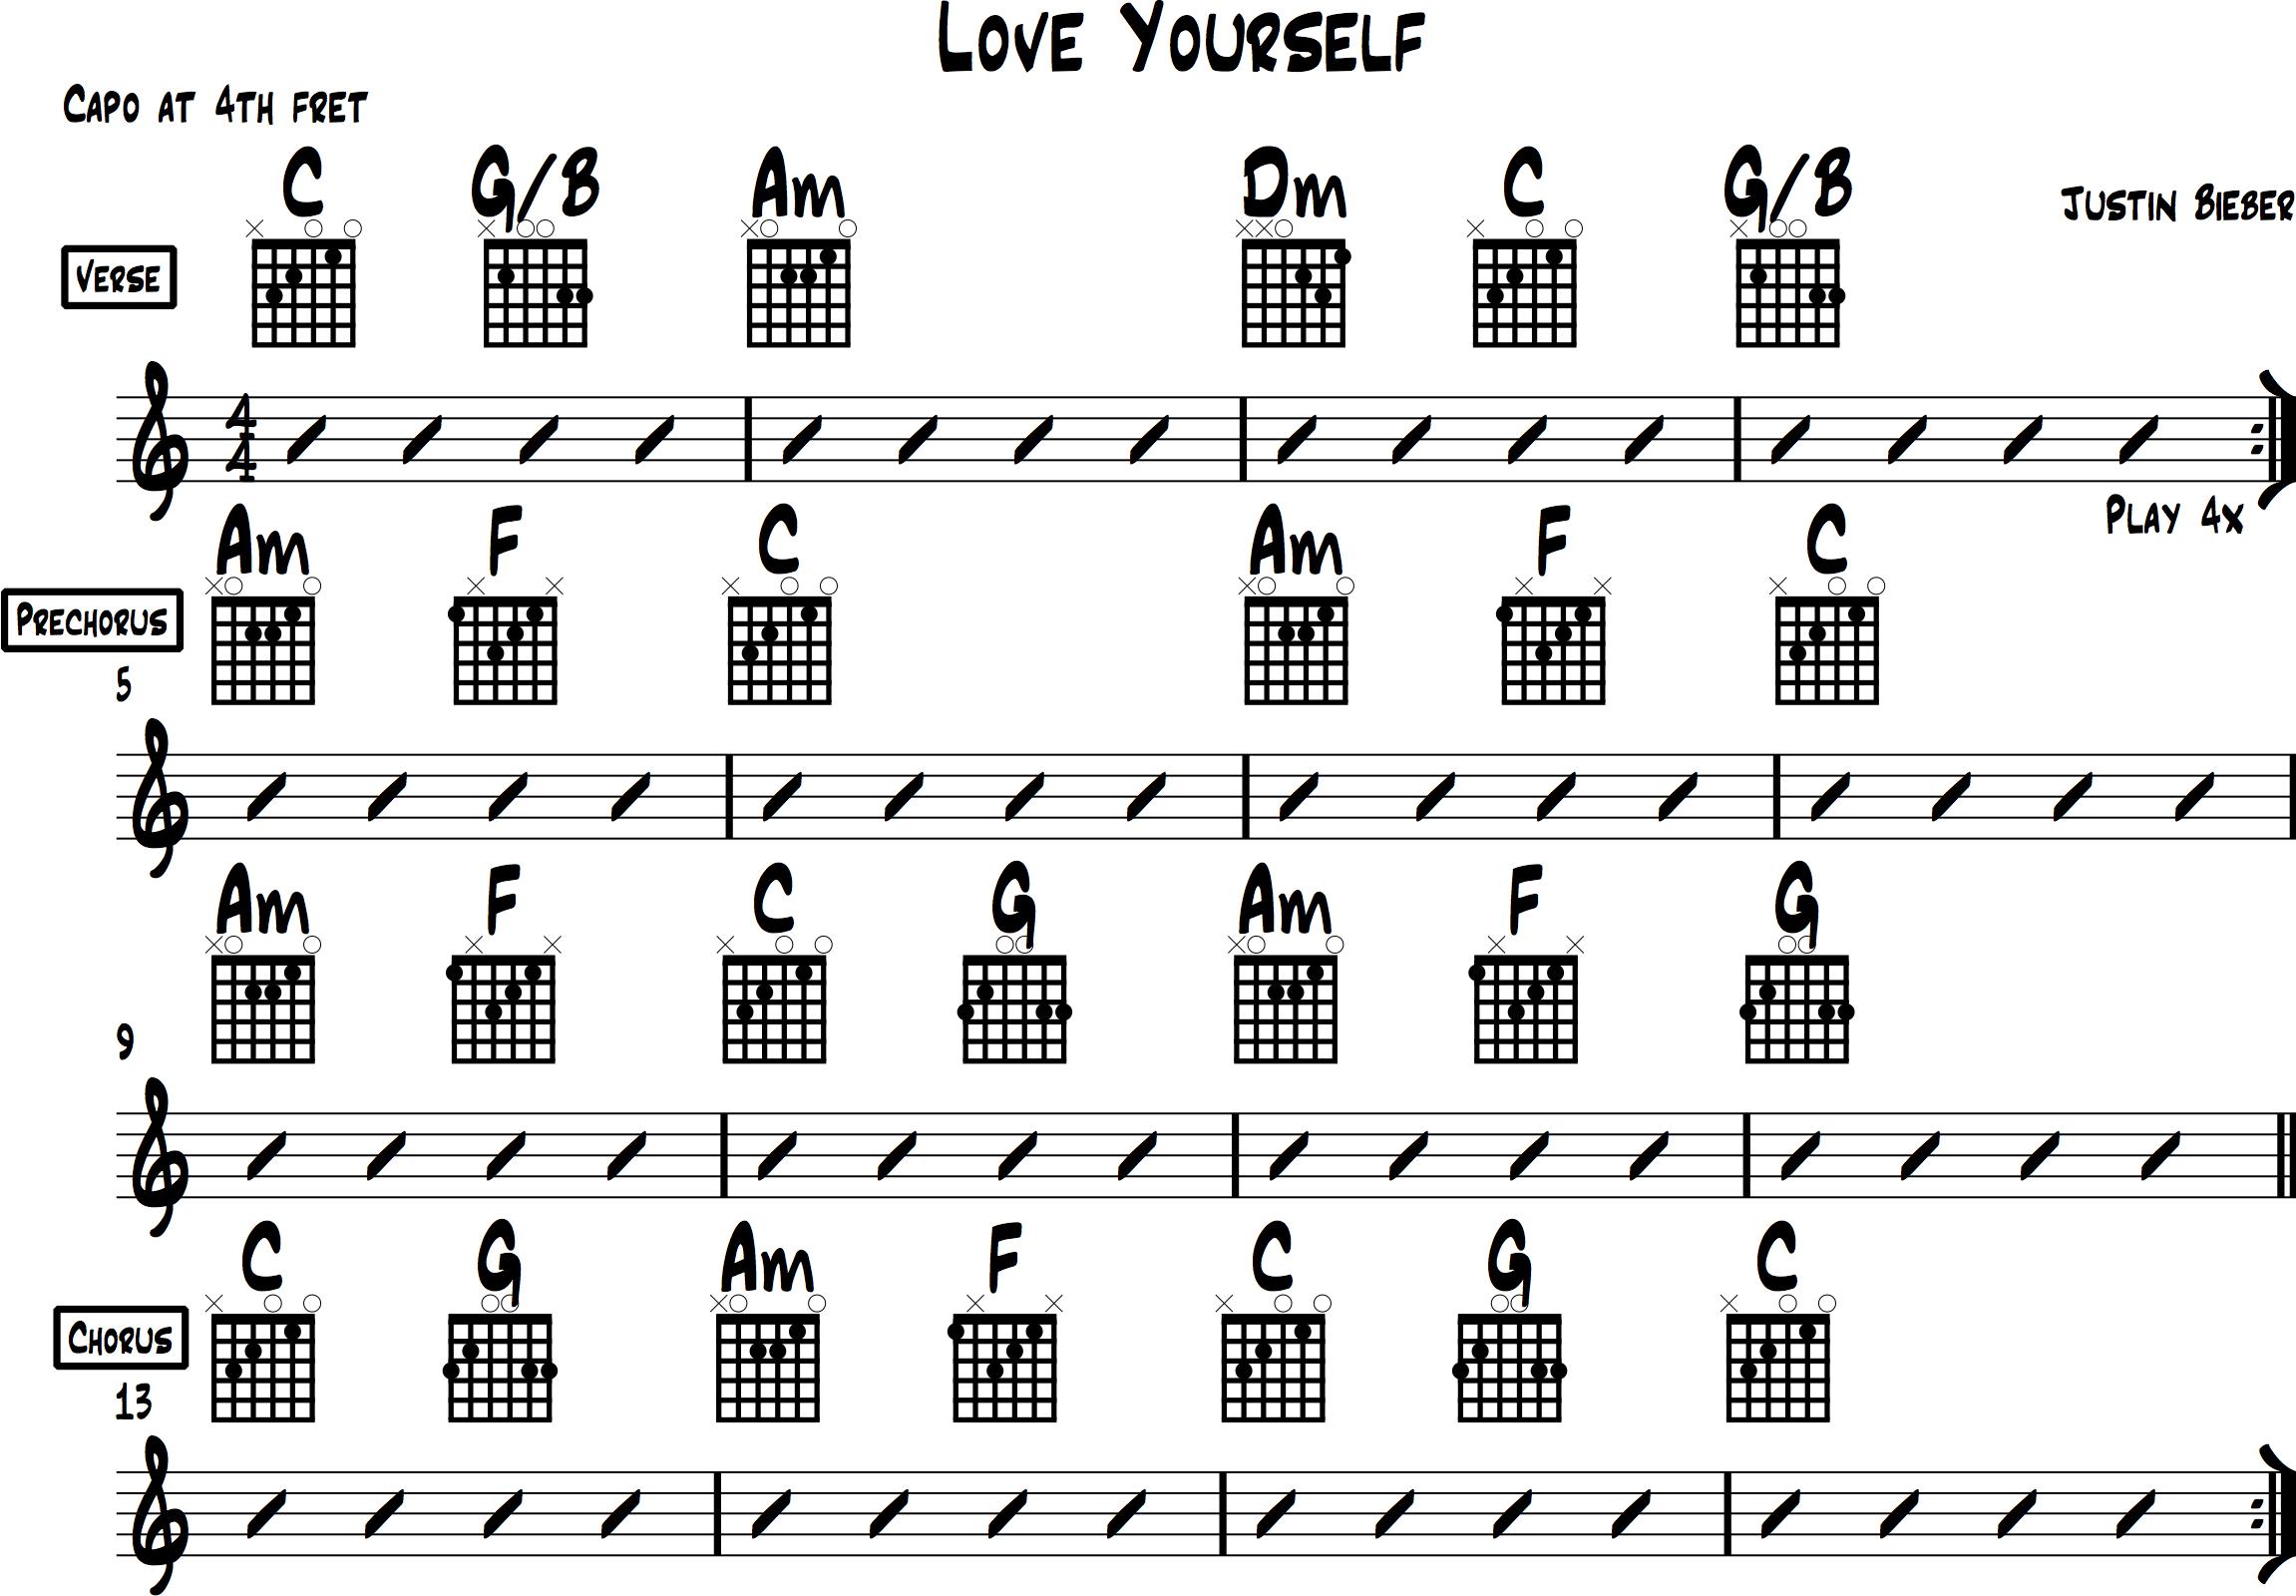 Justin Bieber Love Yourself Guitar Chords - Justin Bieber ...